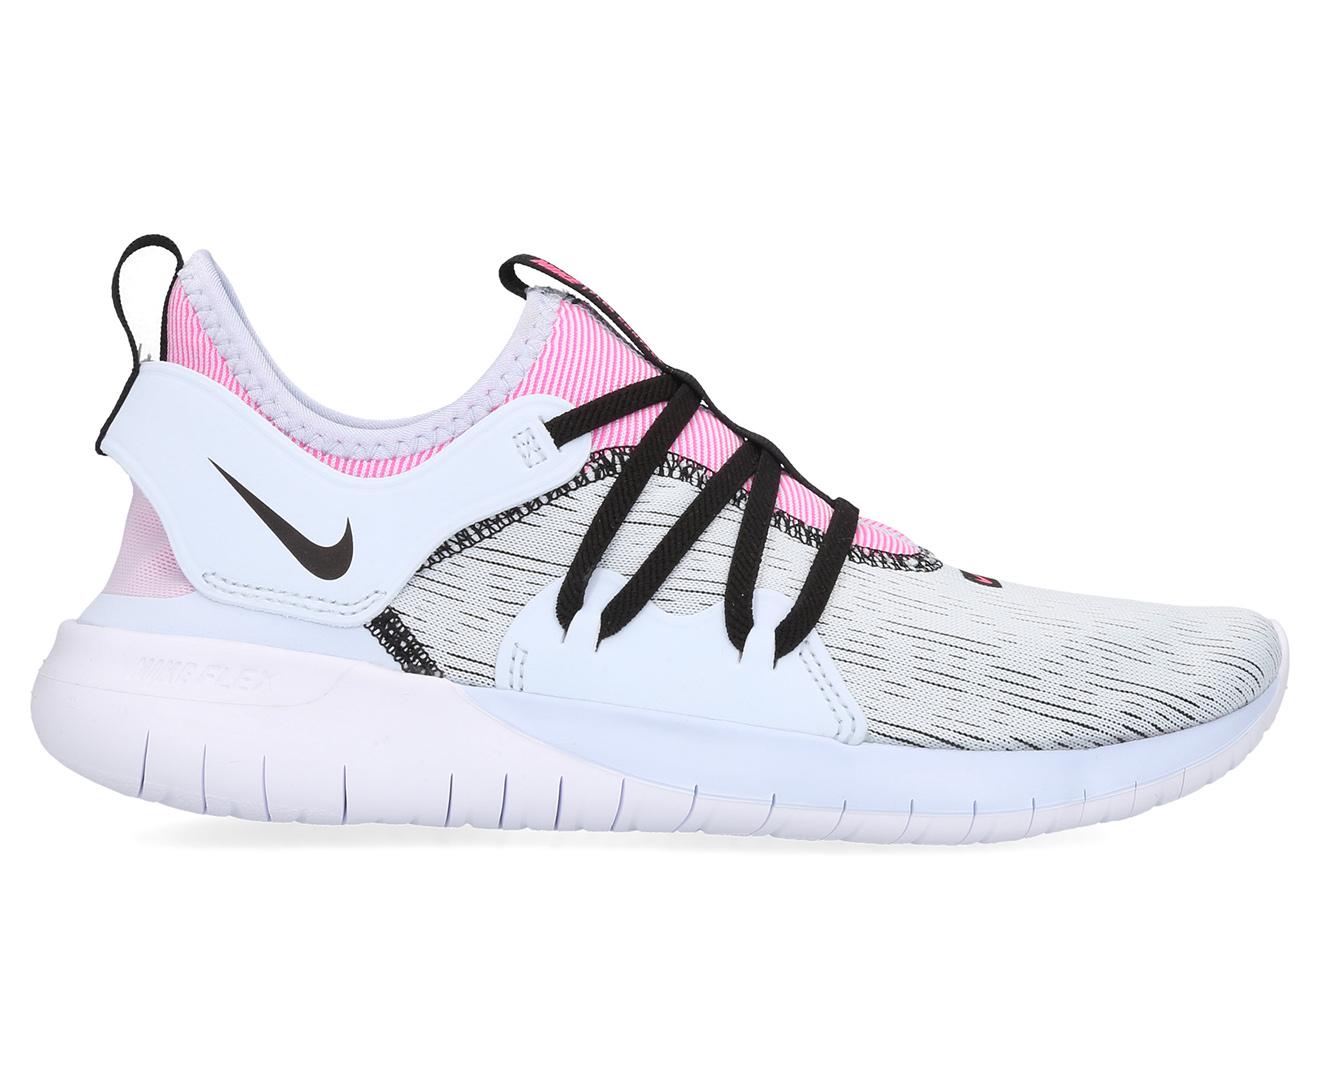 Details about Nike Women's Flex Contact 3 Training Sports Shoes Half BlueBlackHyper Pink